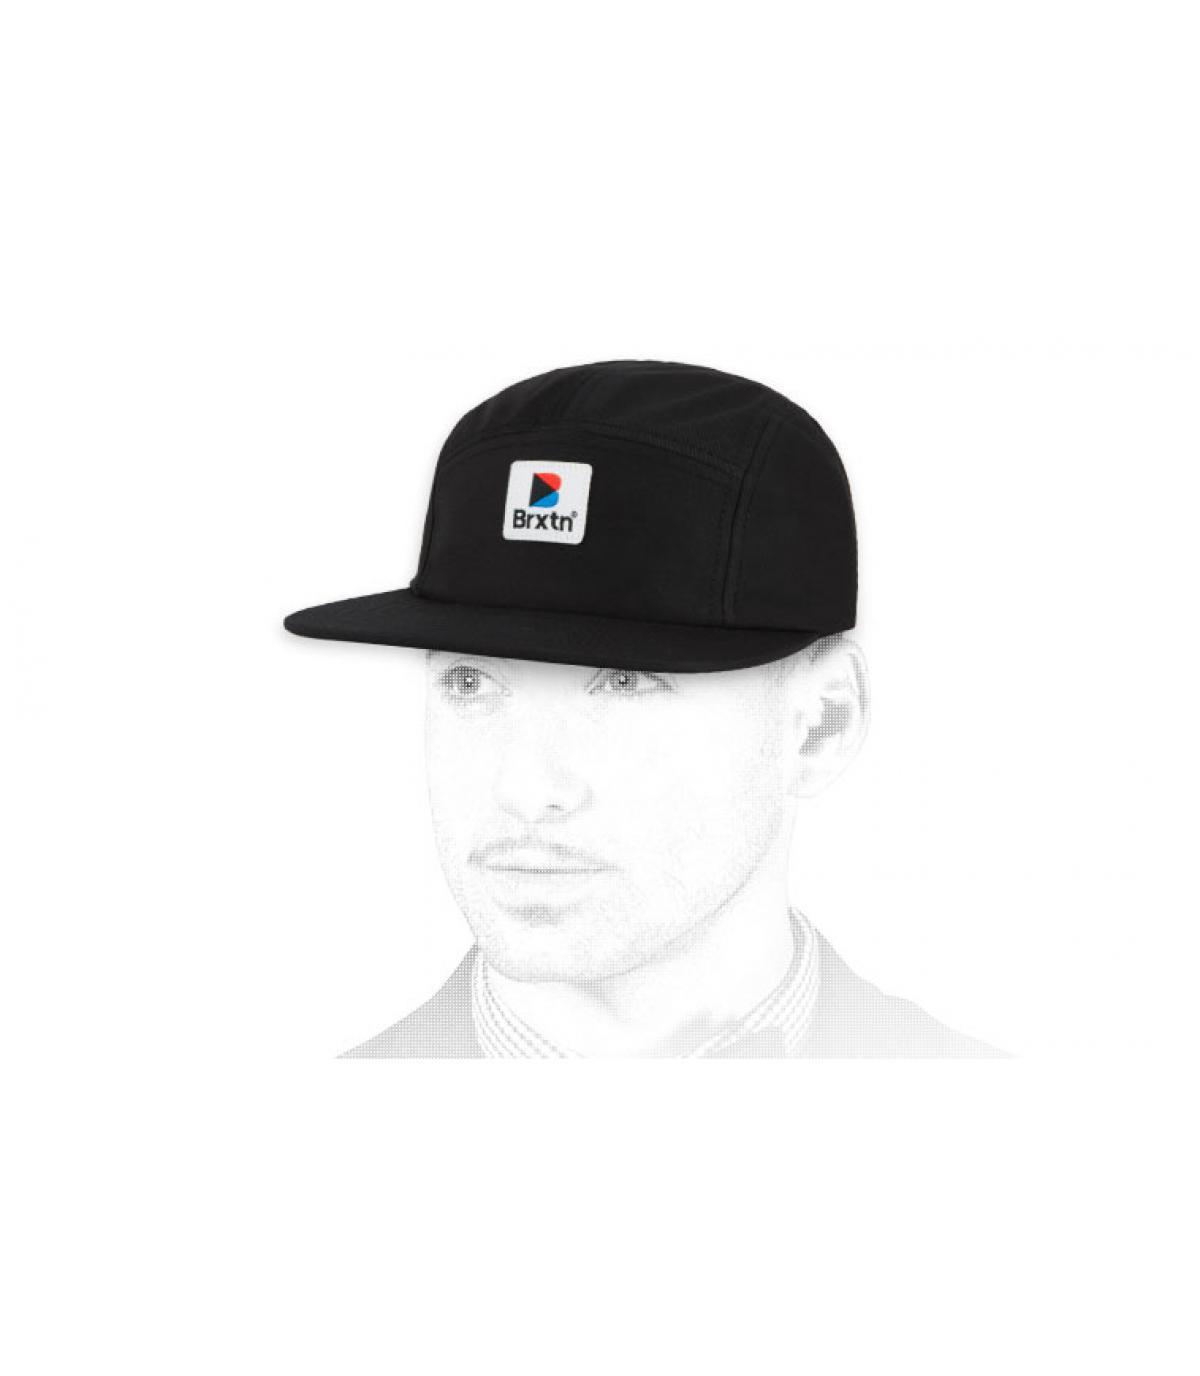 gorra 5 panel negro Brixton